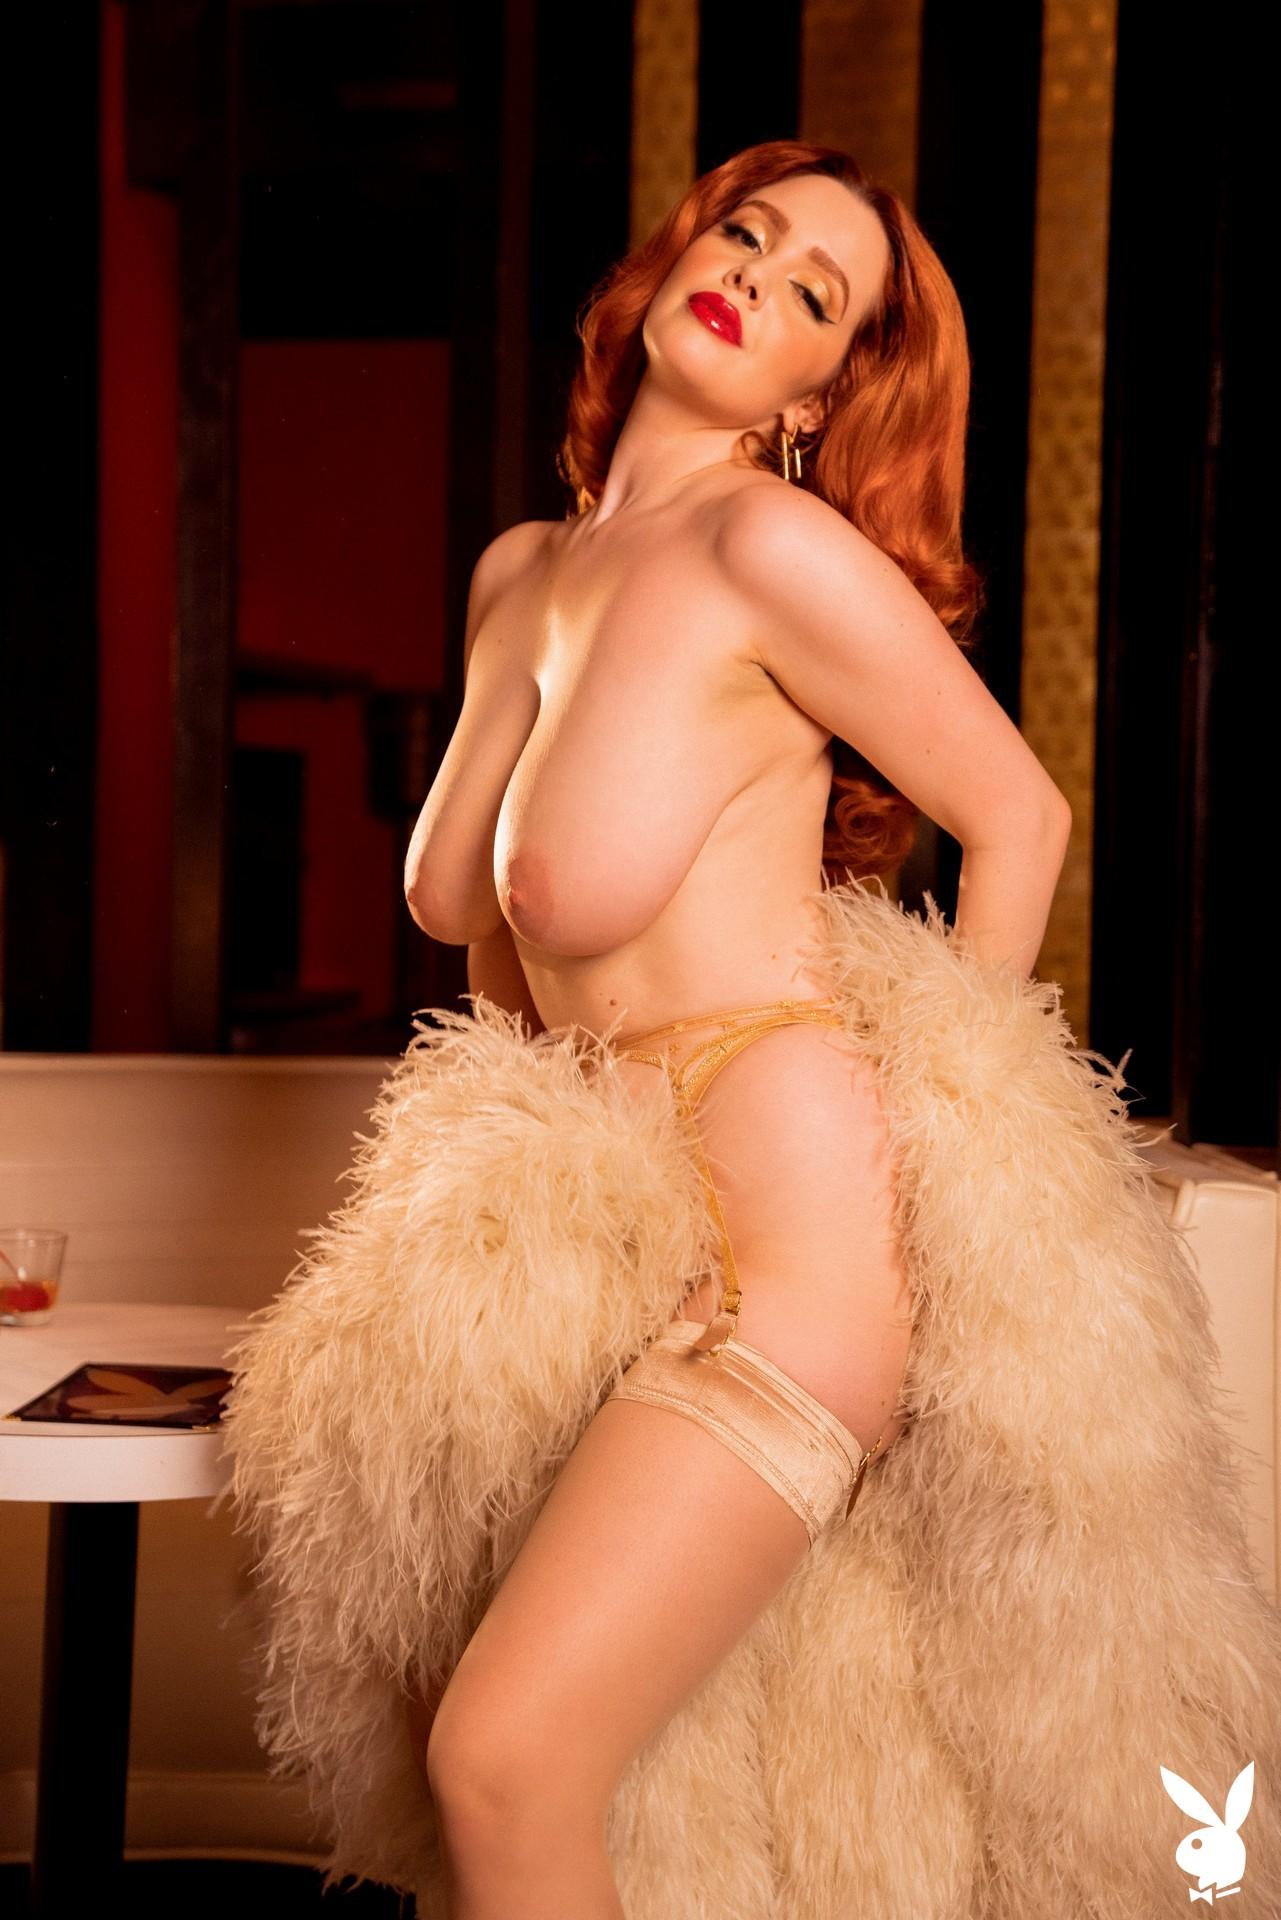 Minxie In Private Affair Playboy Plus (6)